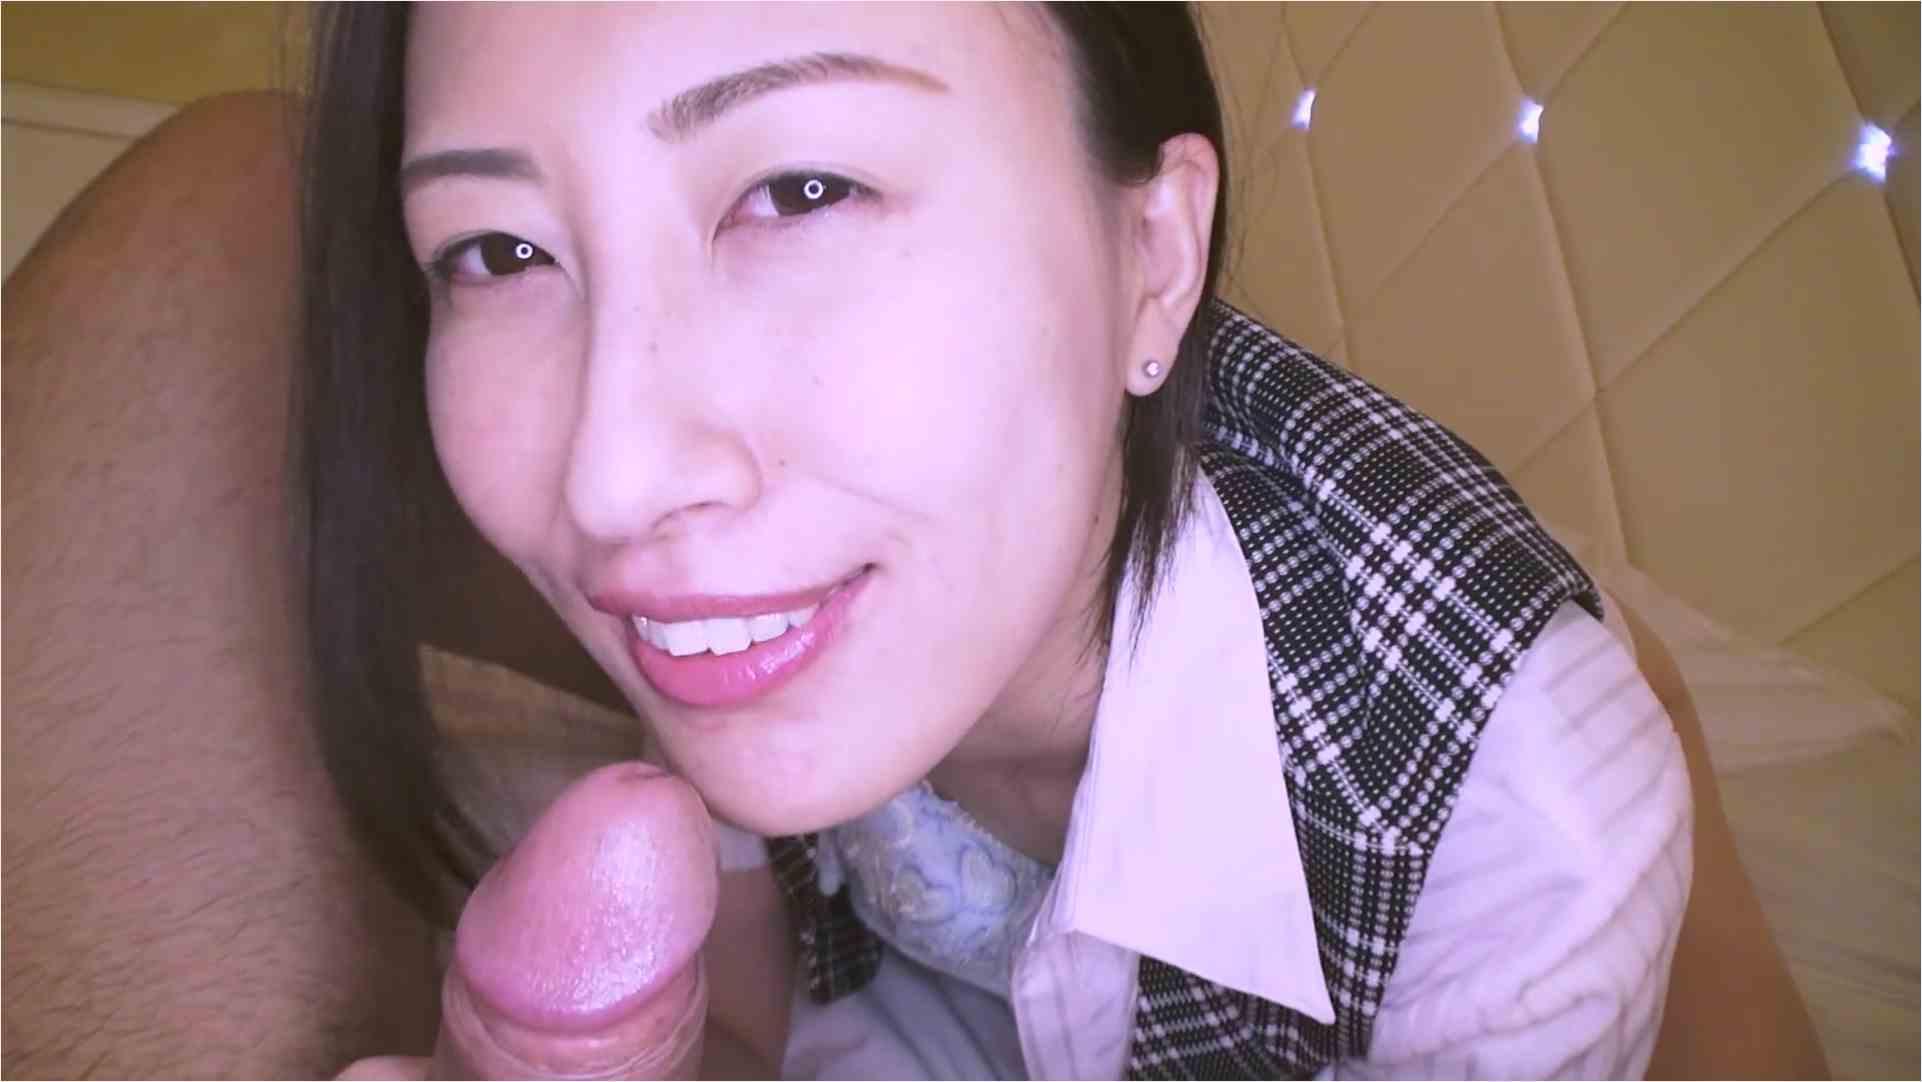 Pacopacomama-021219_033-働く地方のお母さん ~剛毛の保険外交員編~菊池くみこ